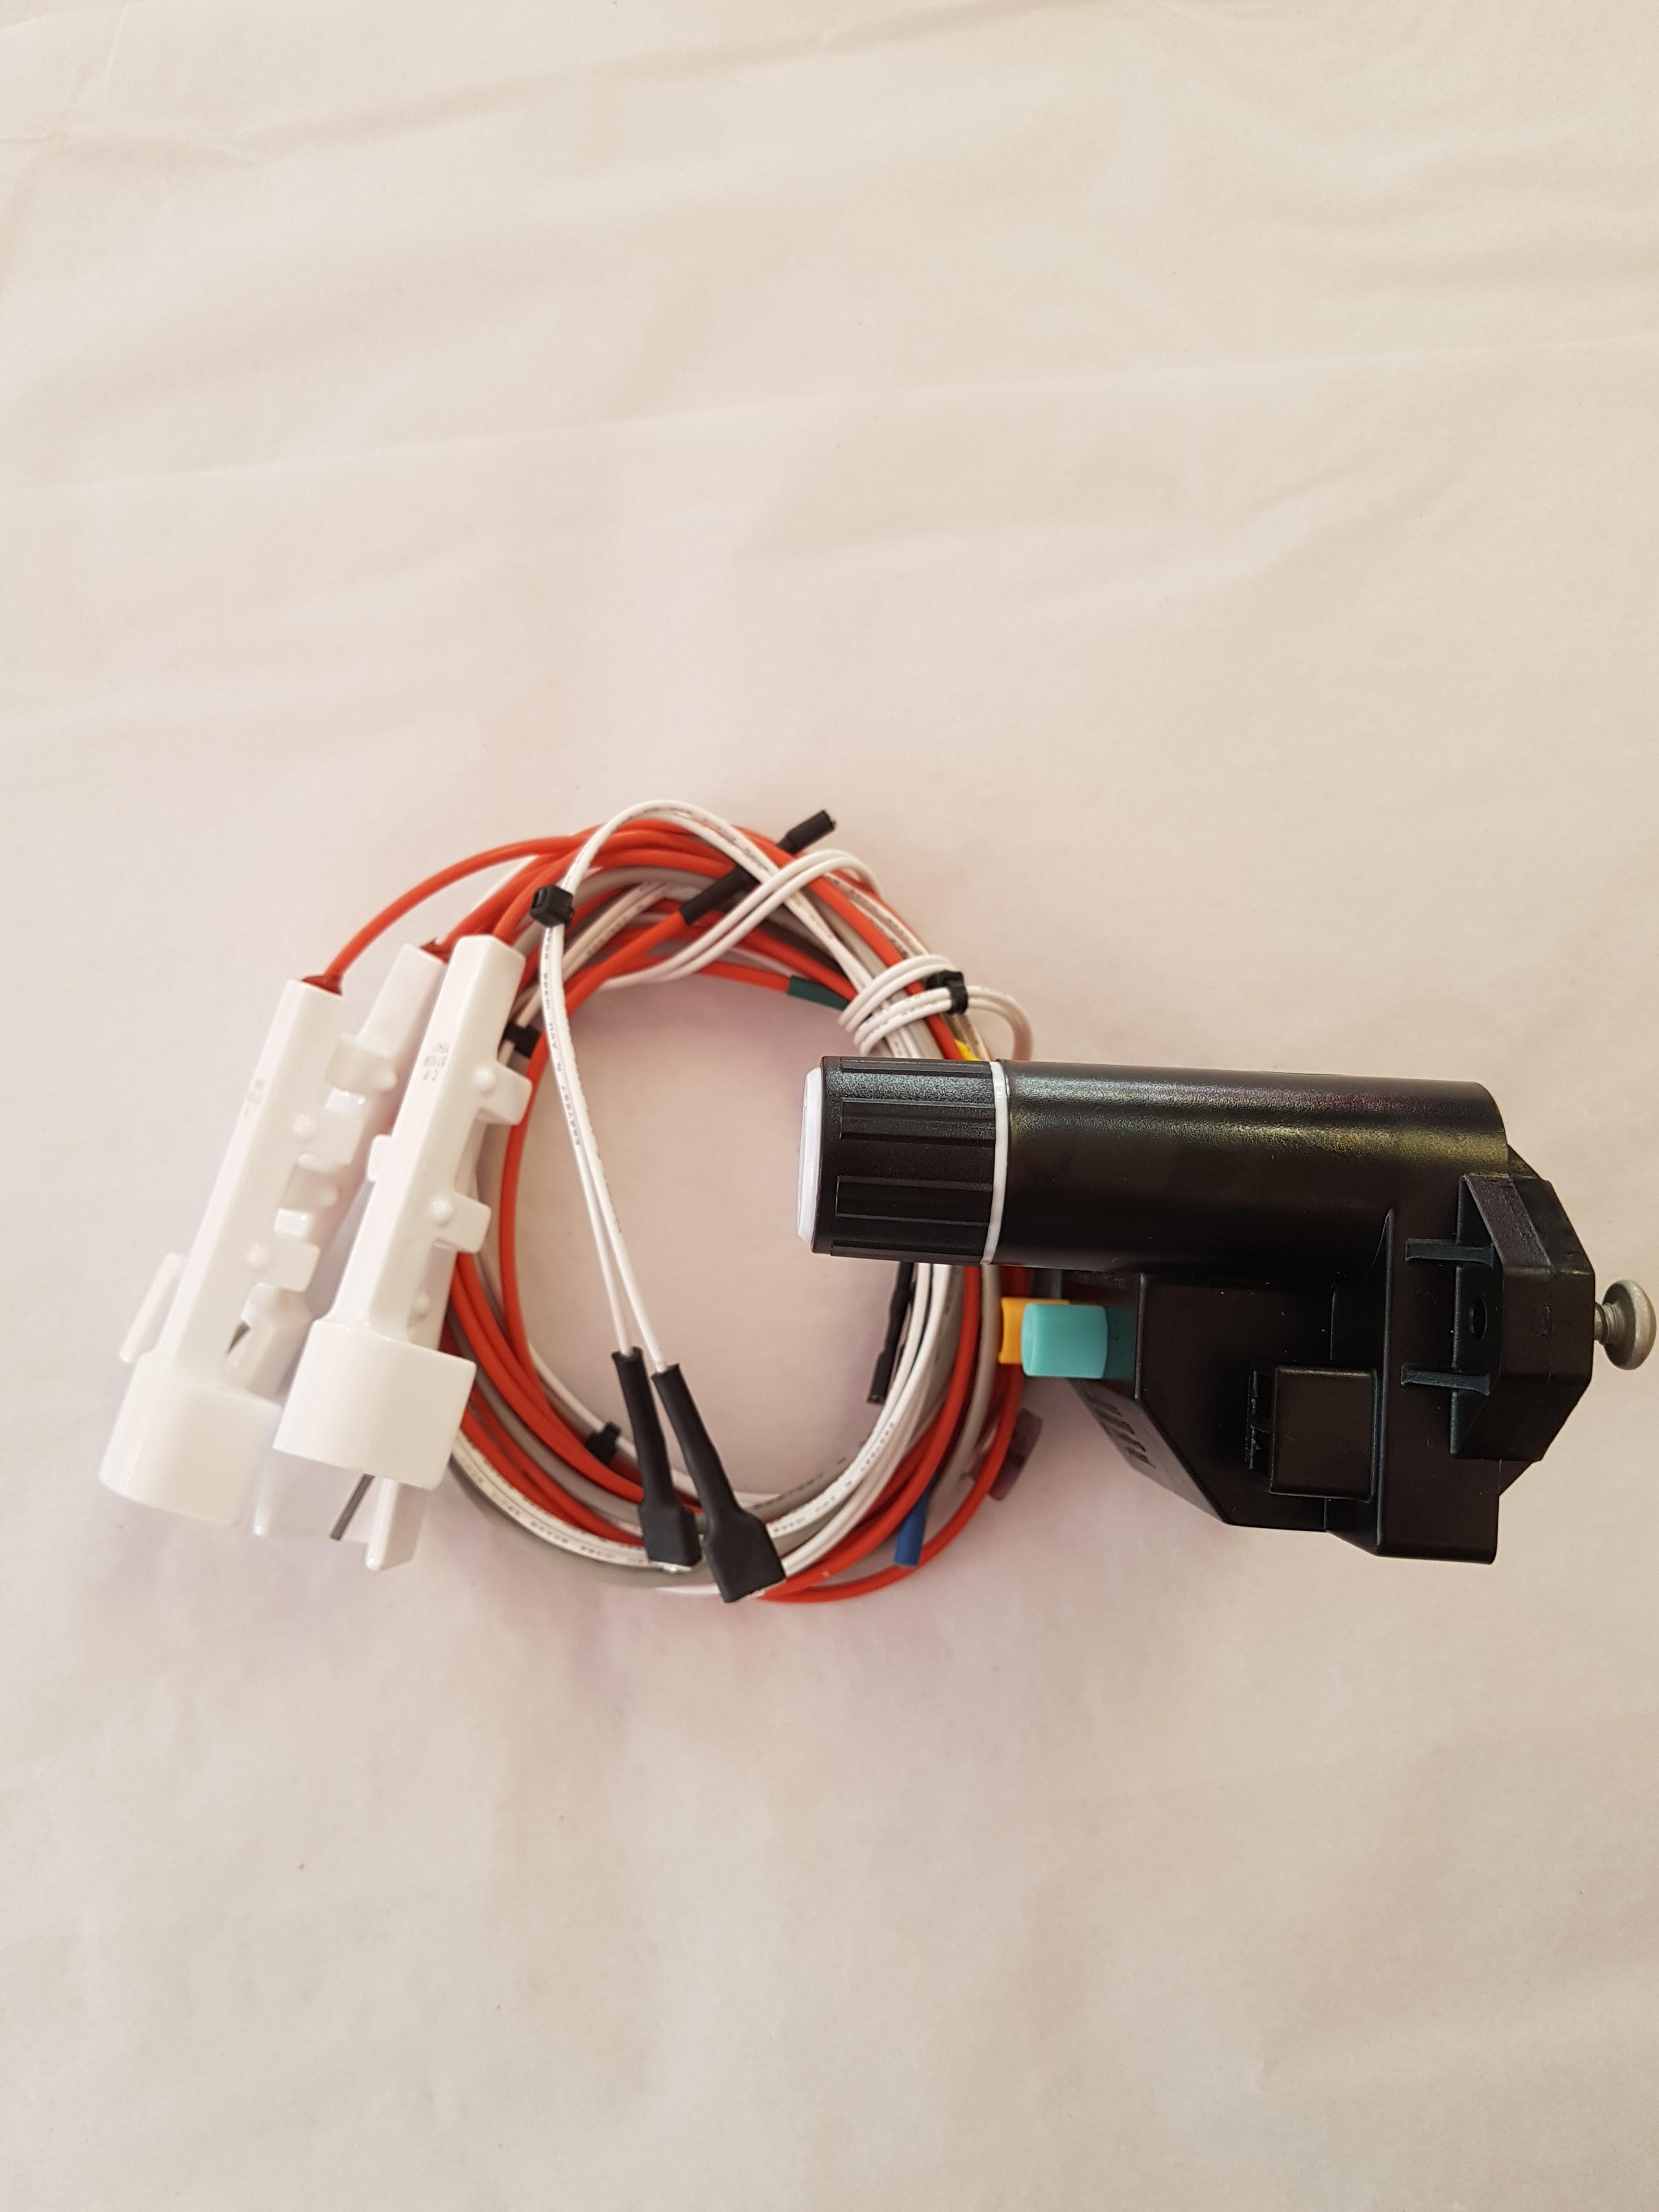 Elektrische Zündungs-Set Genesis II 200-Serie